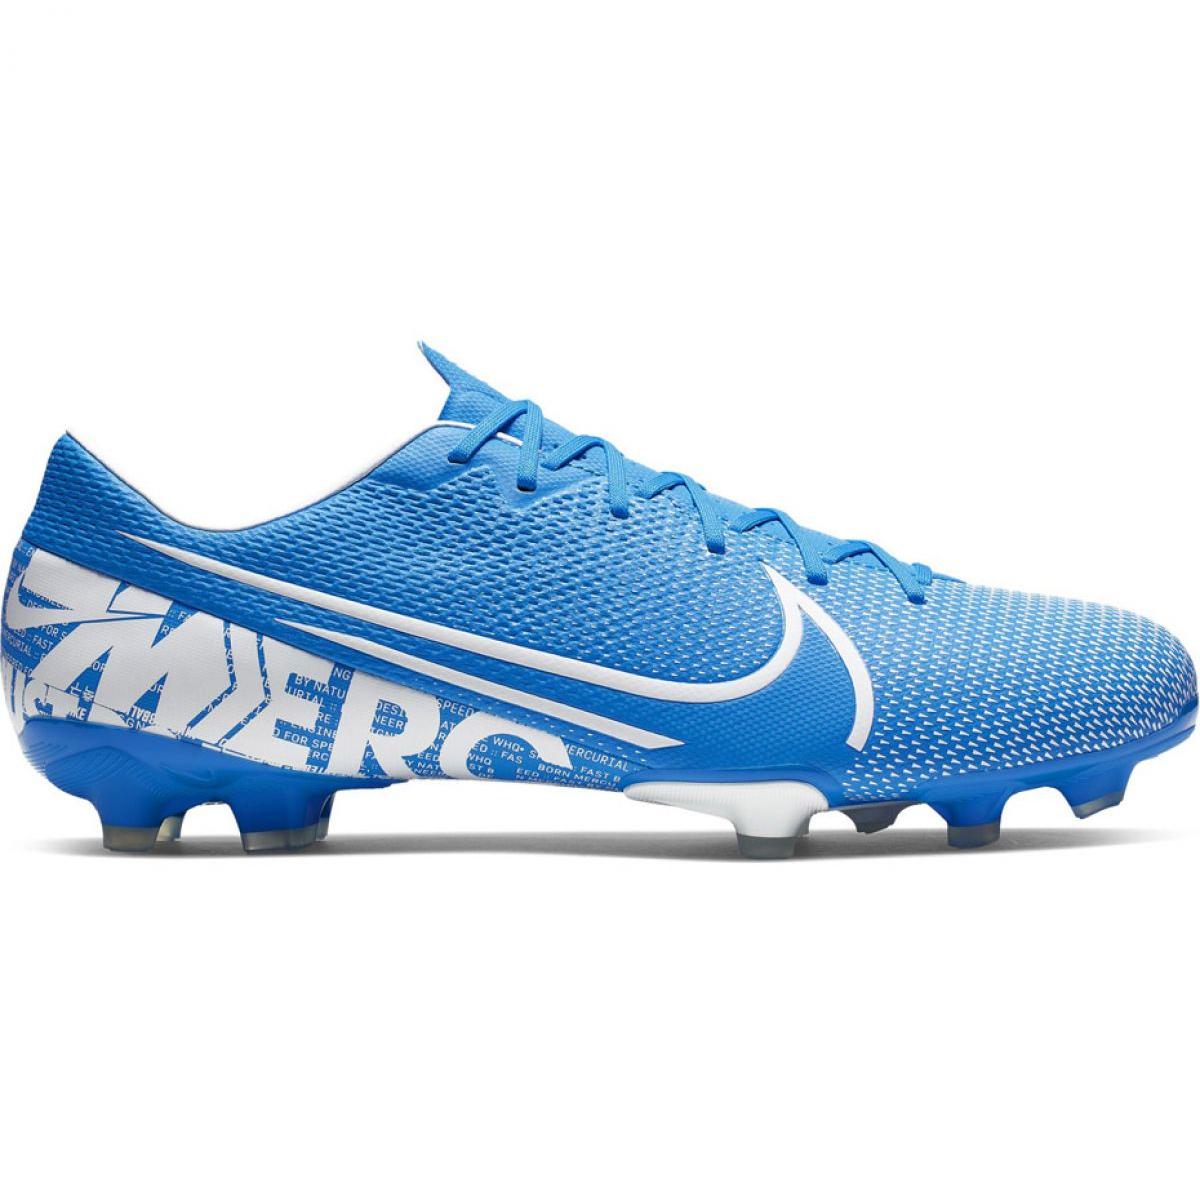 Dettagli su Scarpe da calcio Nike Mercurial Vapor 13 Academy FG MG M AT5269 414 blu blu